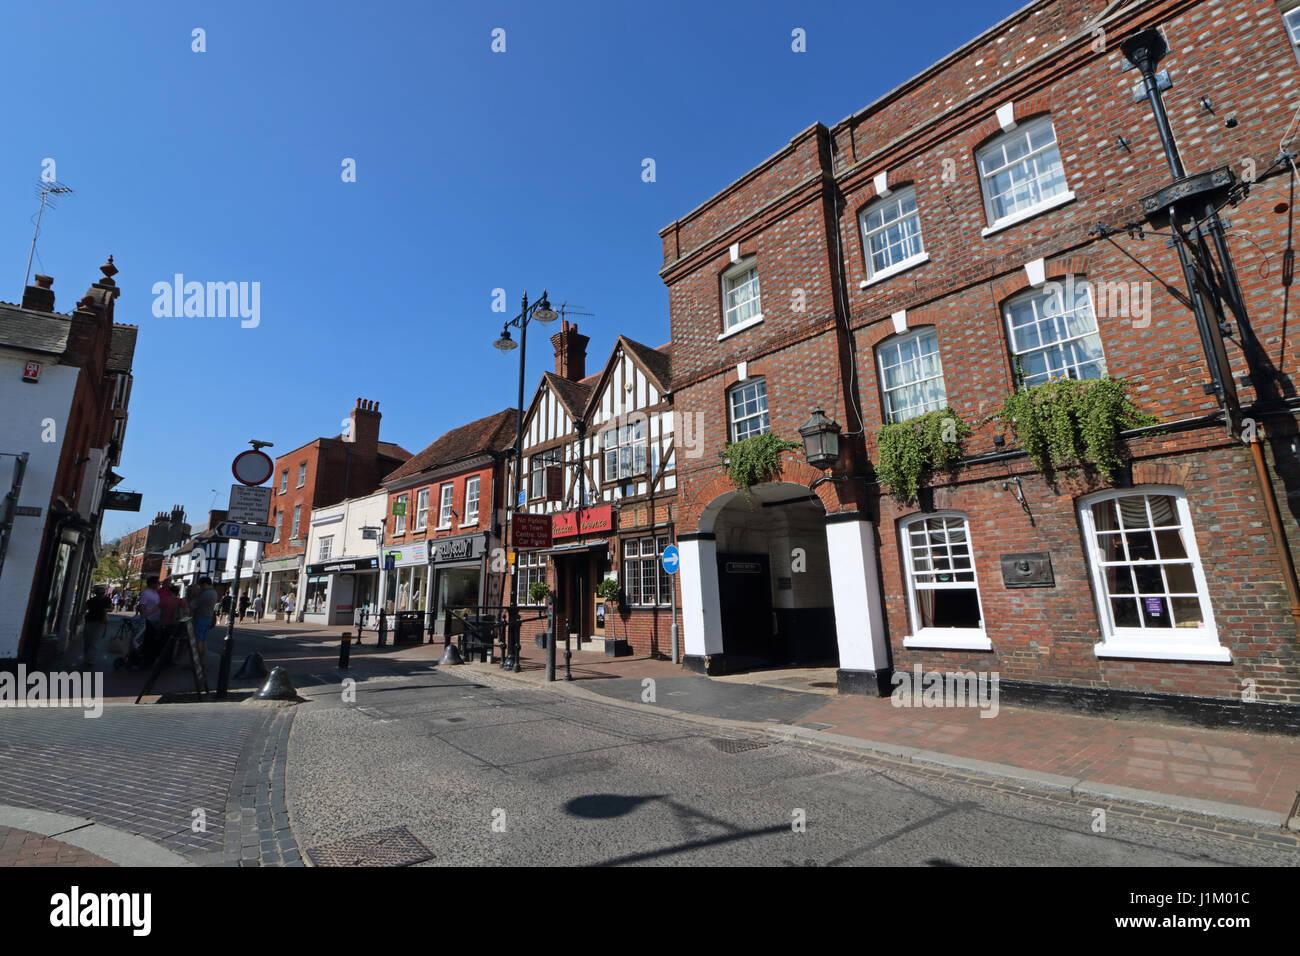 High street shopping Godalming Surrey England - Stock Image